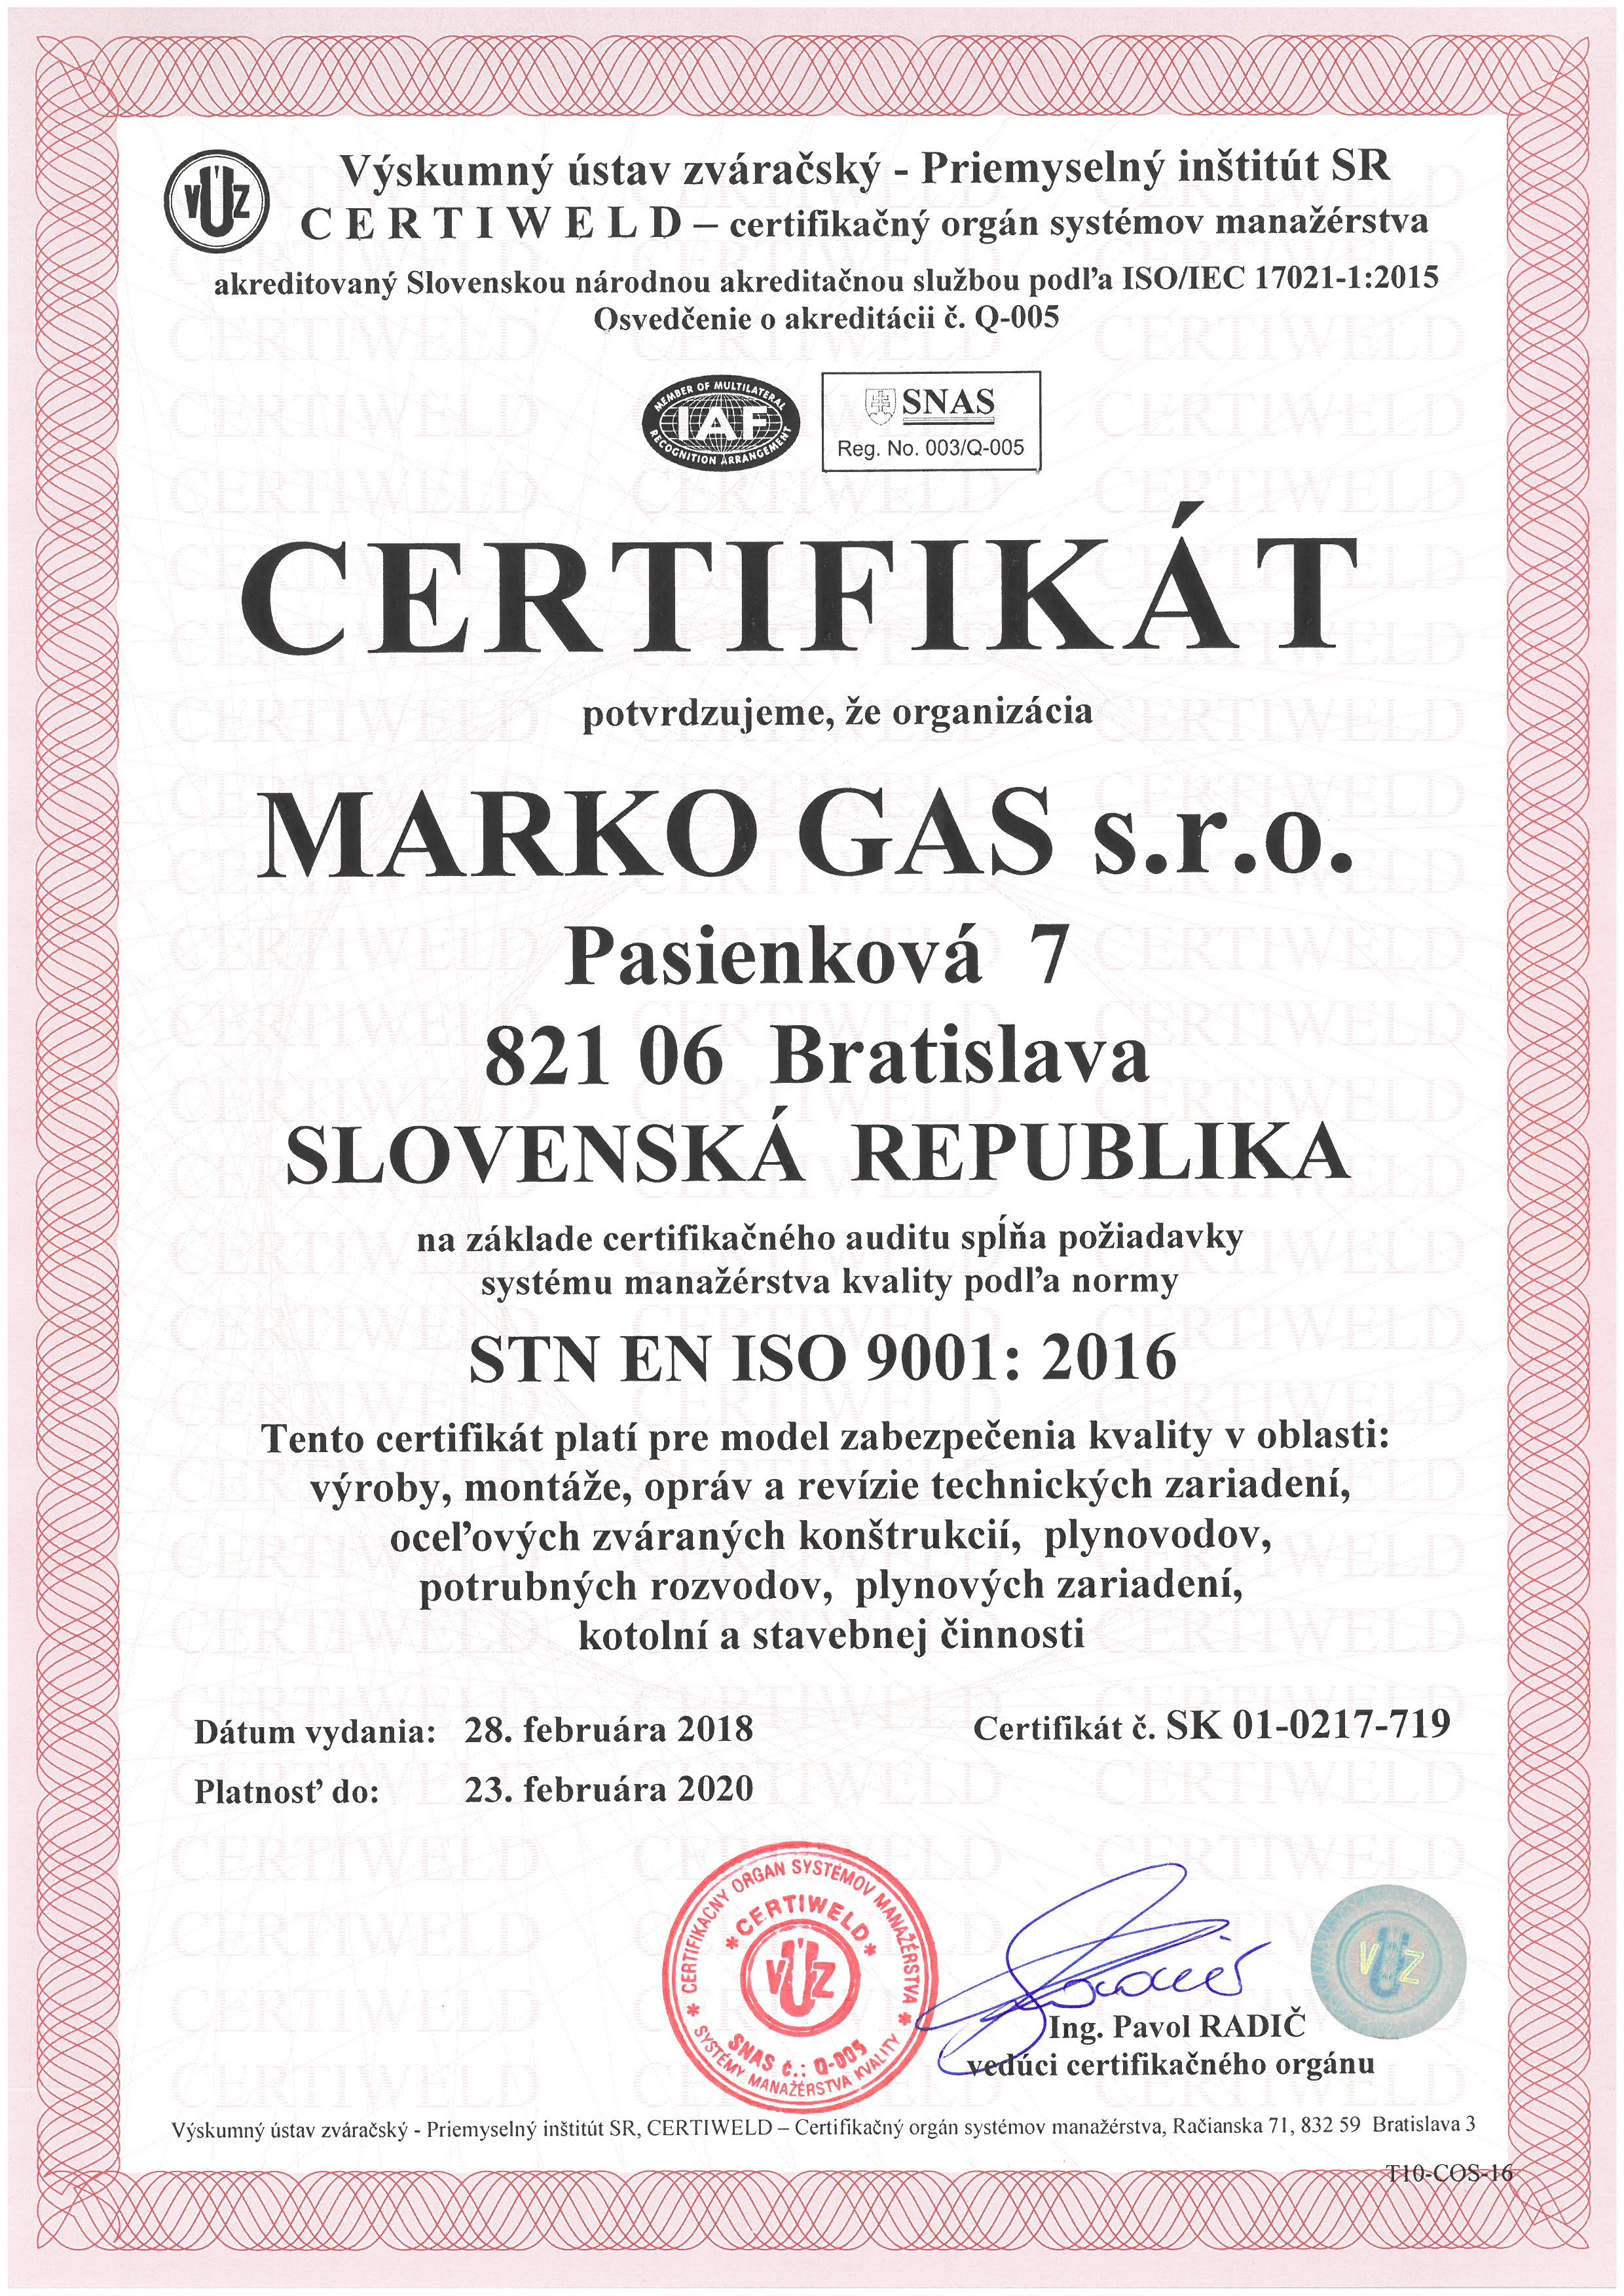 https://sites.google.com/a/markogas.sk/marko-gas-s-r-o/opravnenia-a-certifikaty/stn-iso-9001-2009/9001.jpg.jpg